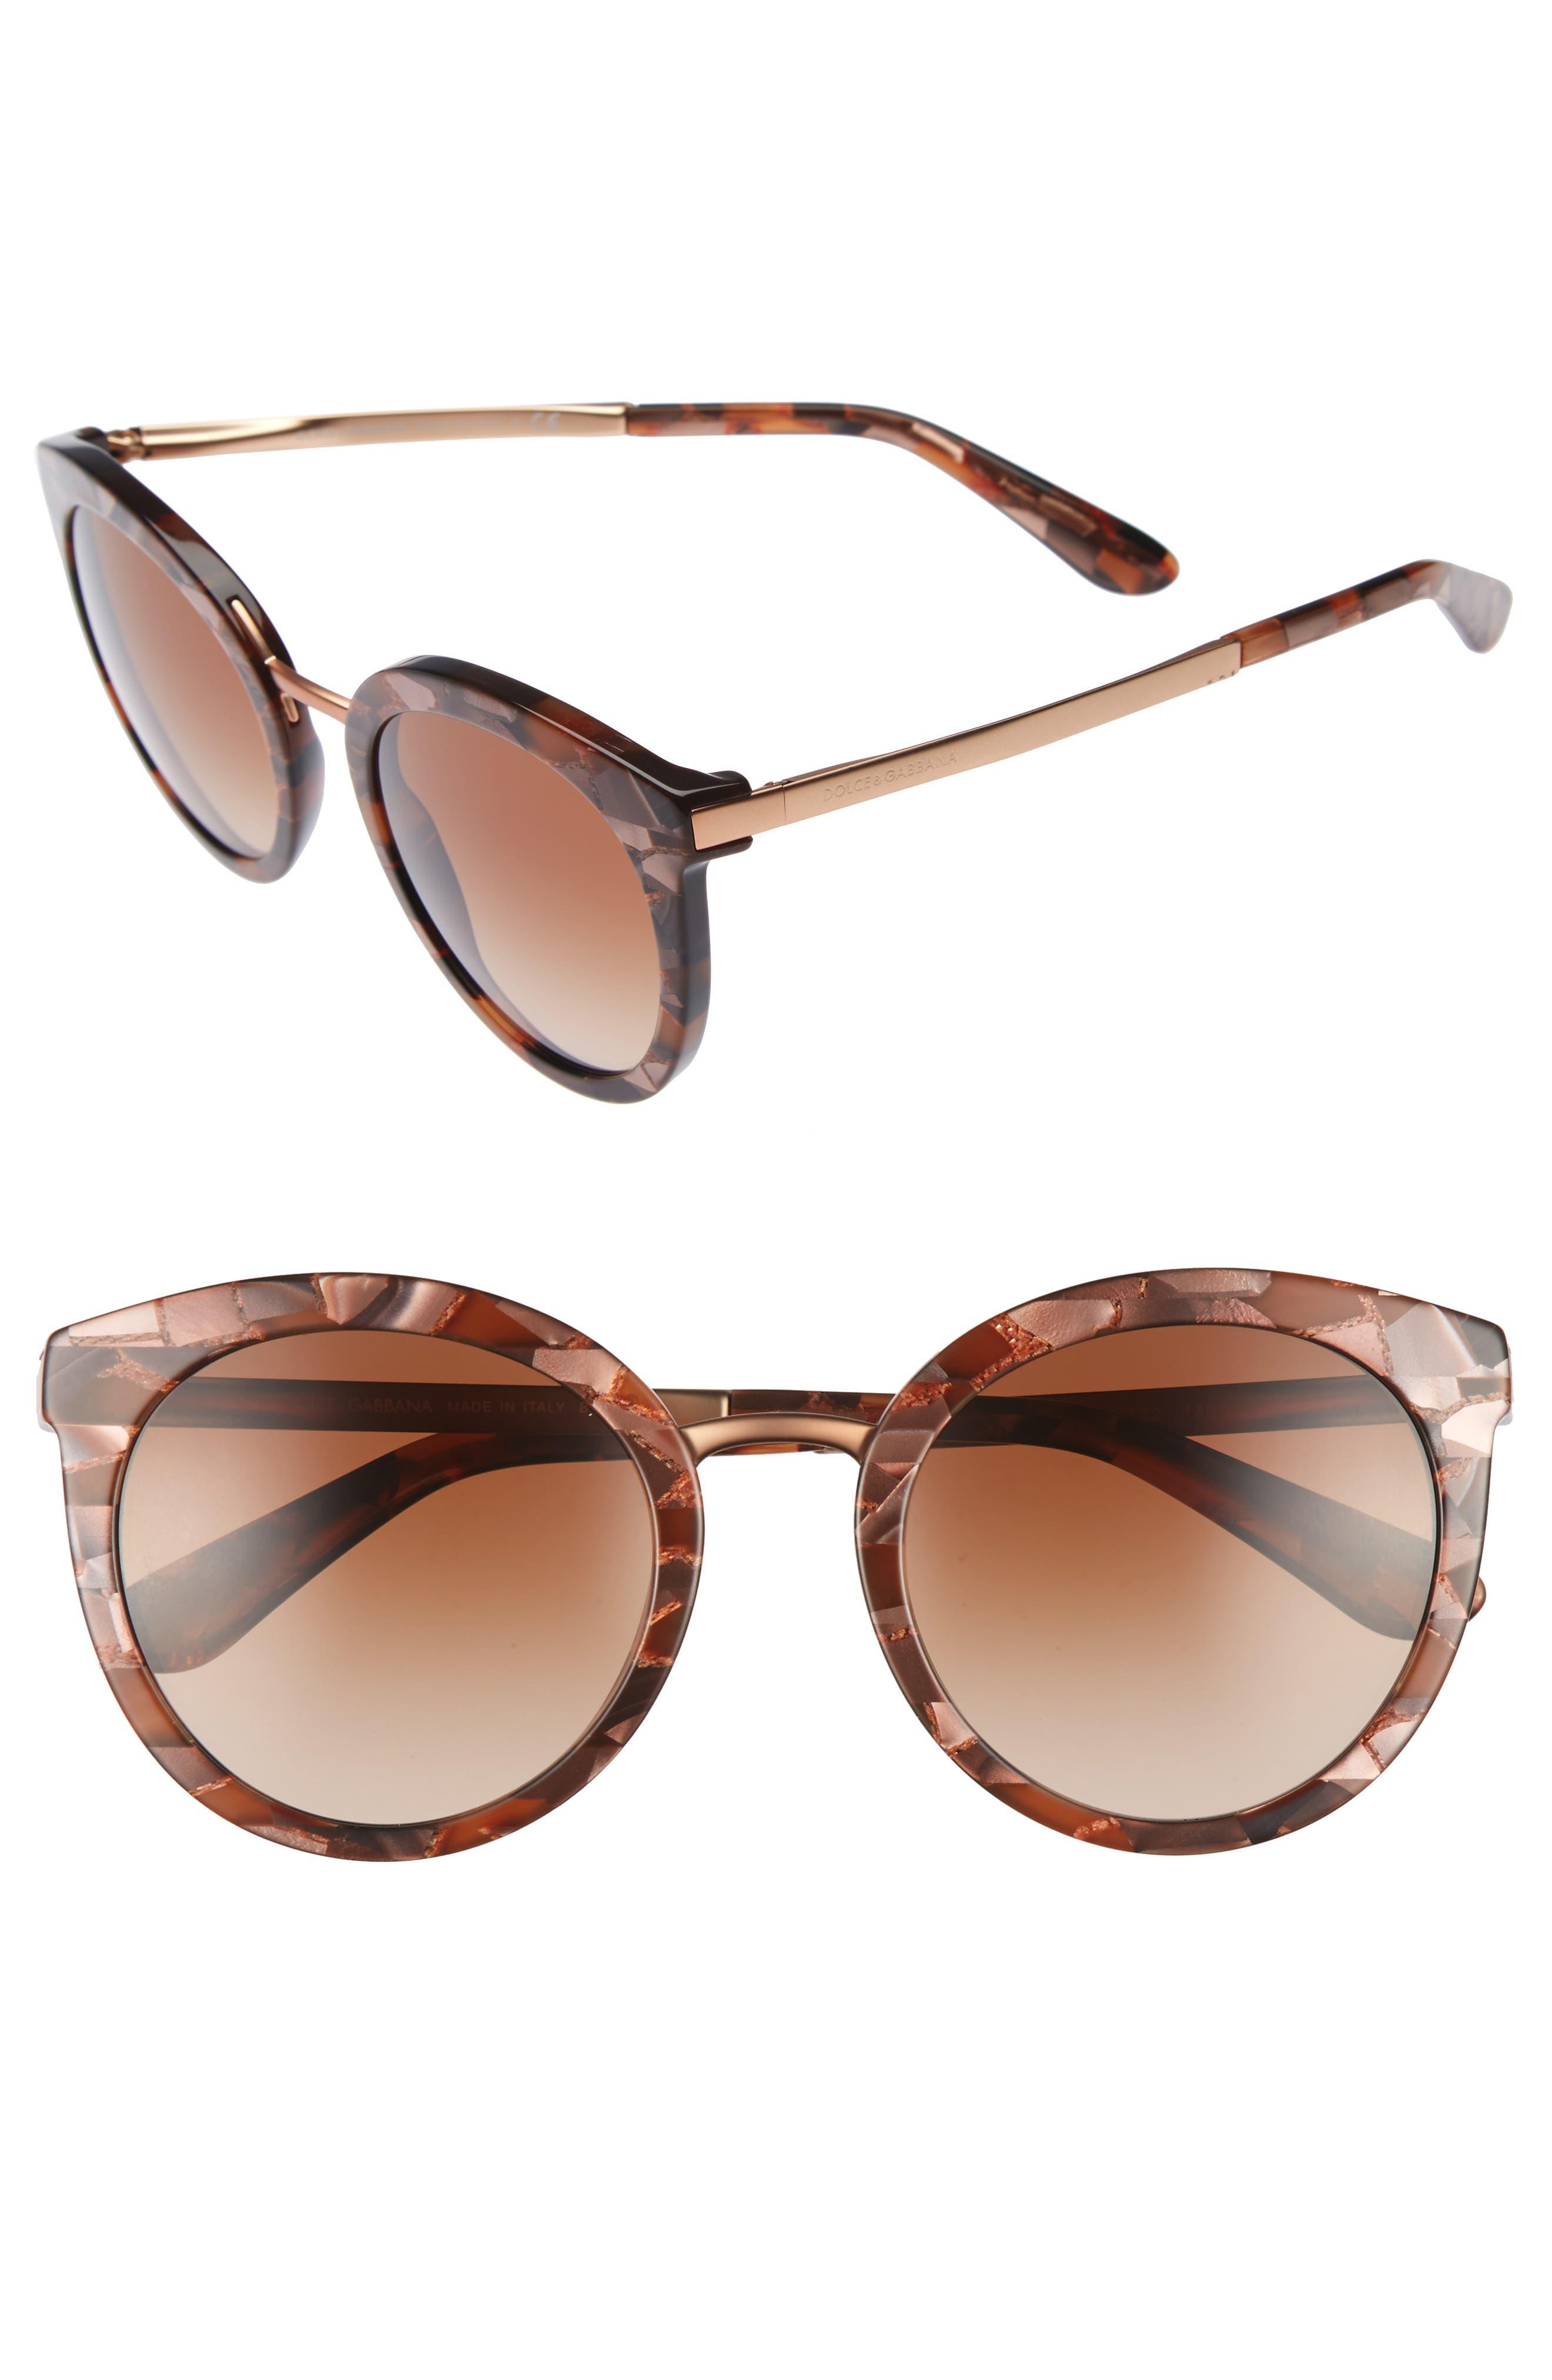 52mm Round Sunglasses,                             Main thumbnail 1, color,                             220